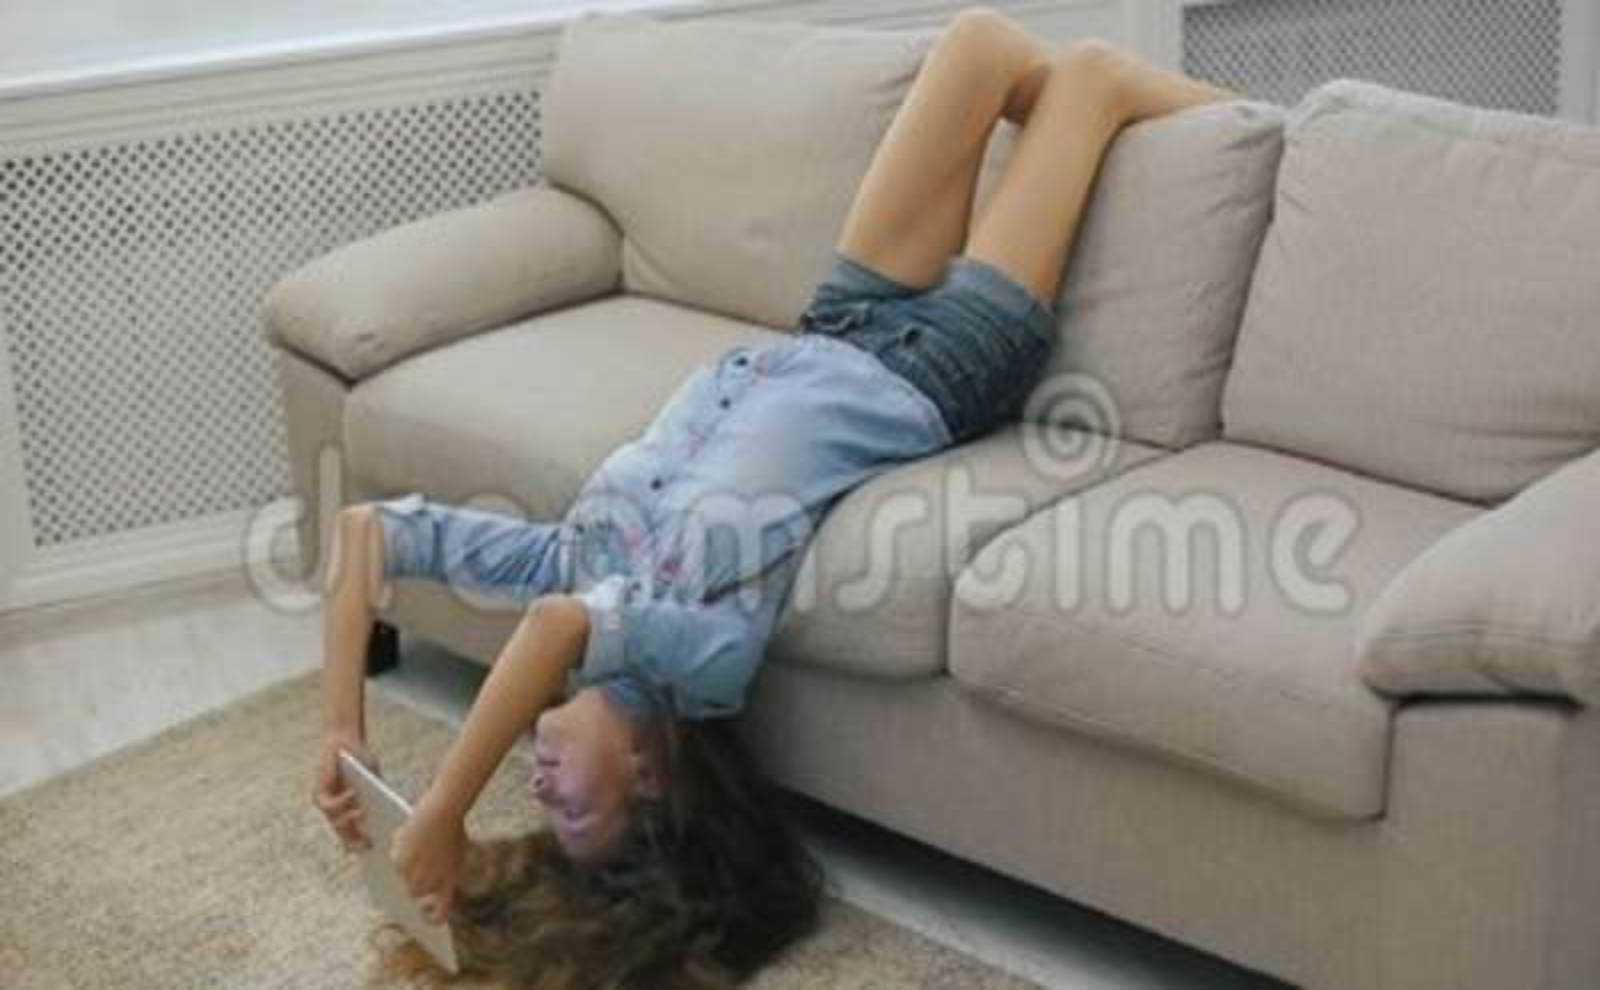 Great Nice Teens On A Sofa